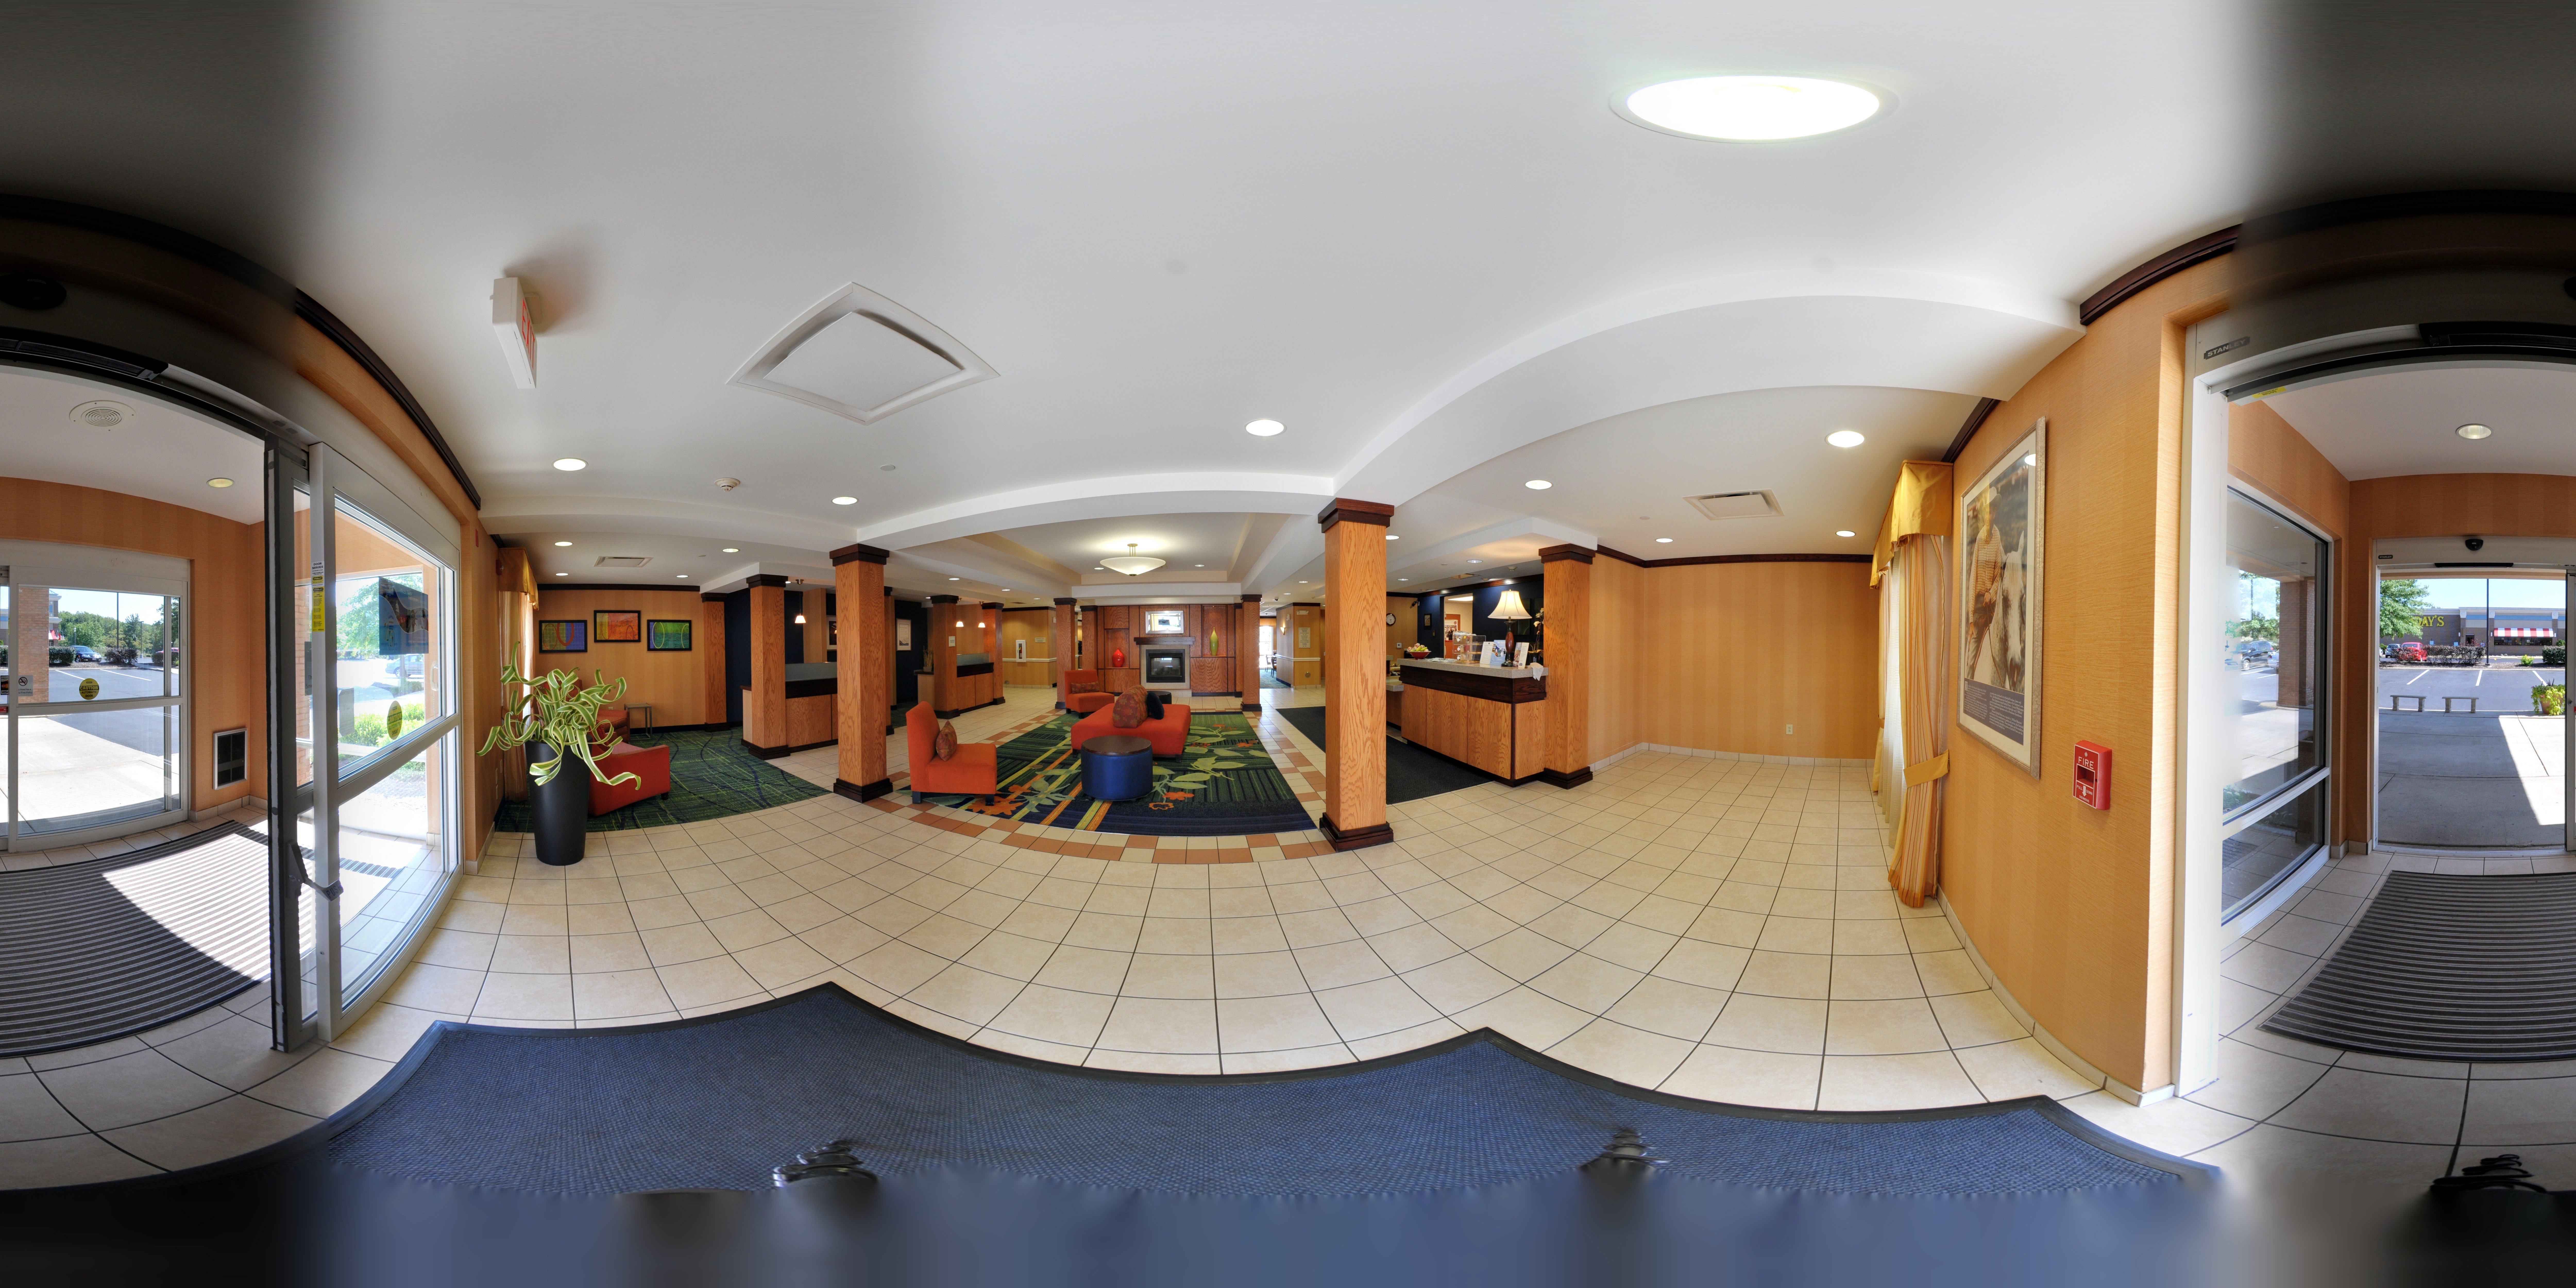 Fairfield Inn & Suites by Marriott Akron South image 36